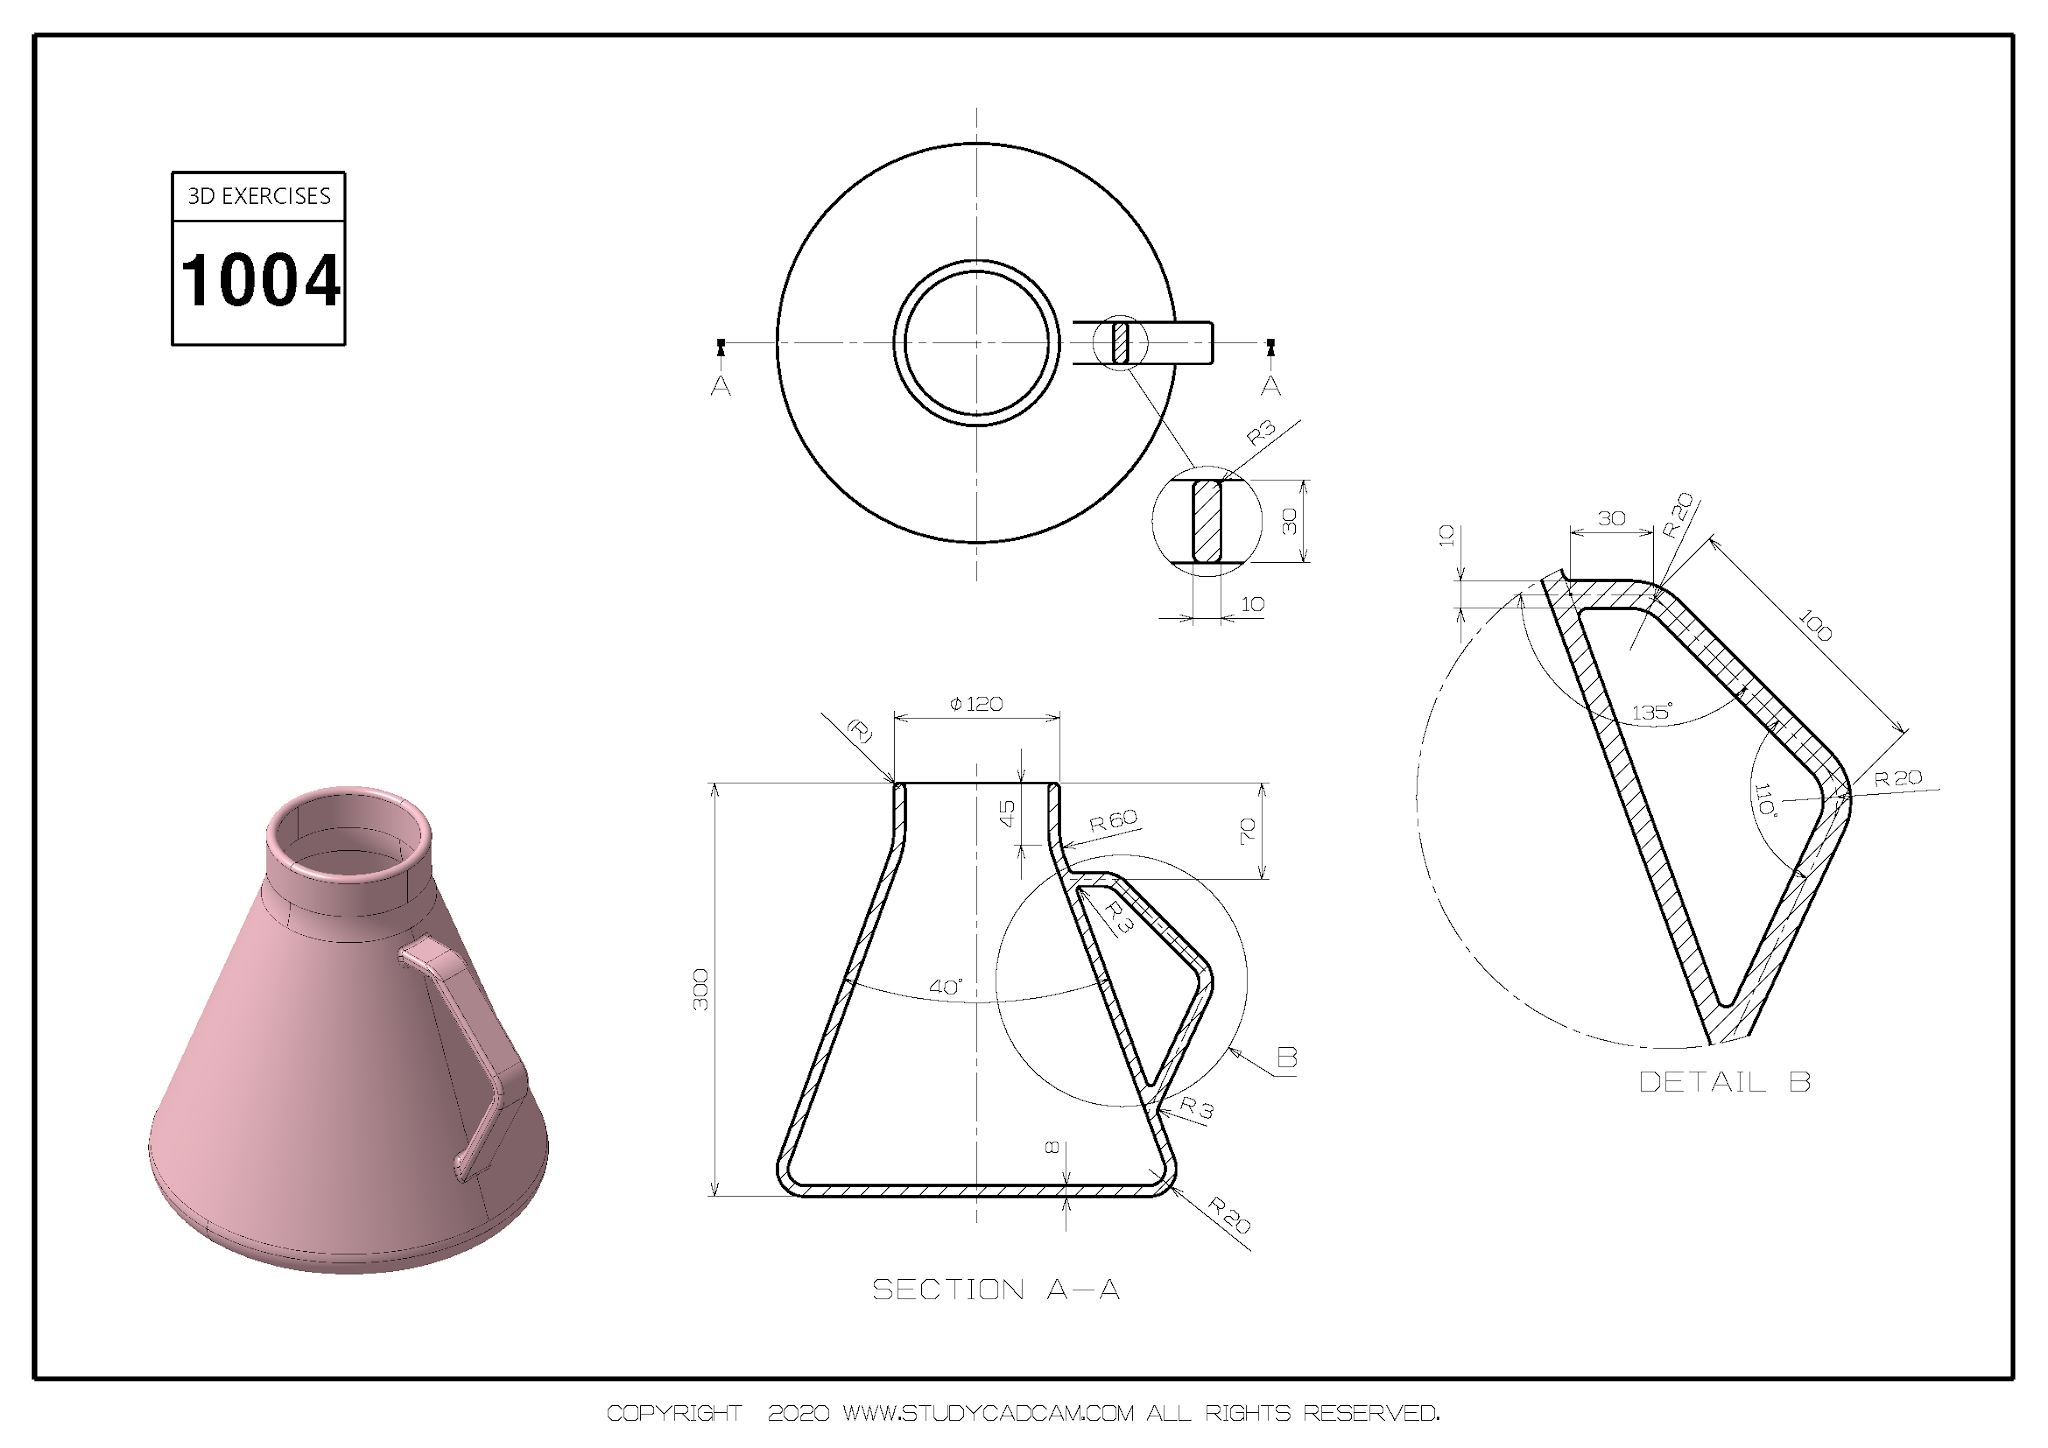 3D CAD EXERCISES 1004 - STUDYCADCAM